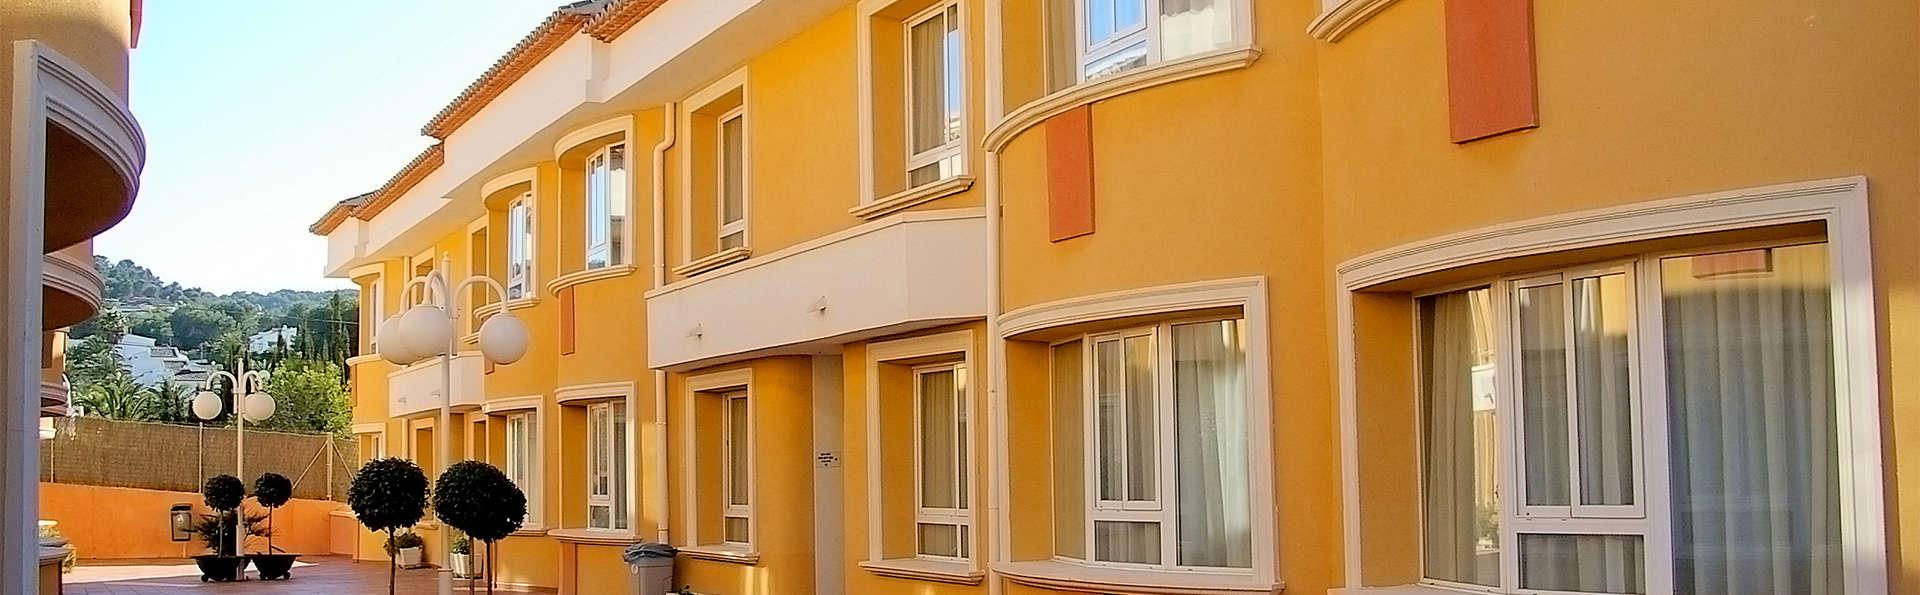 Aparthotel Pinosol - EDIT_Exterior.jpg